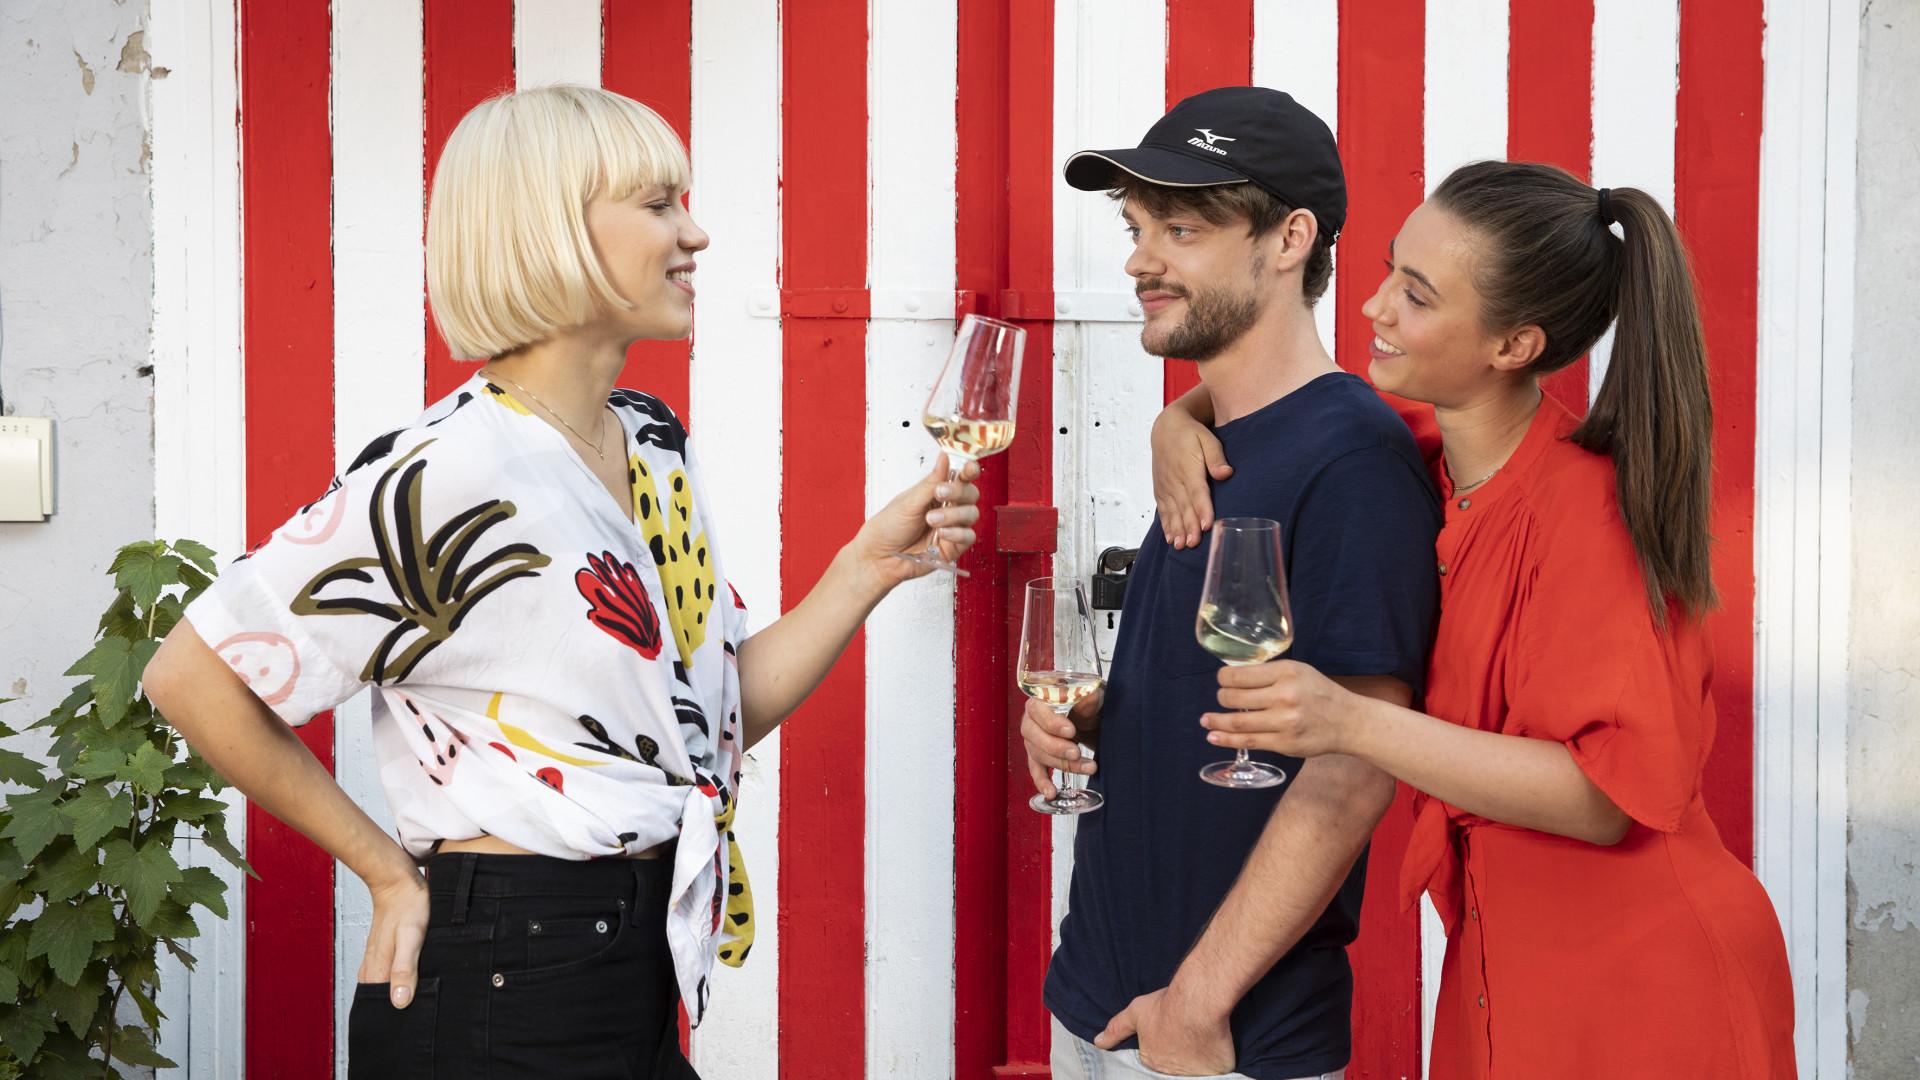 Wines of Germany | Berlin's wine scene has grown up